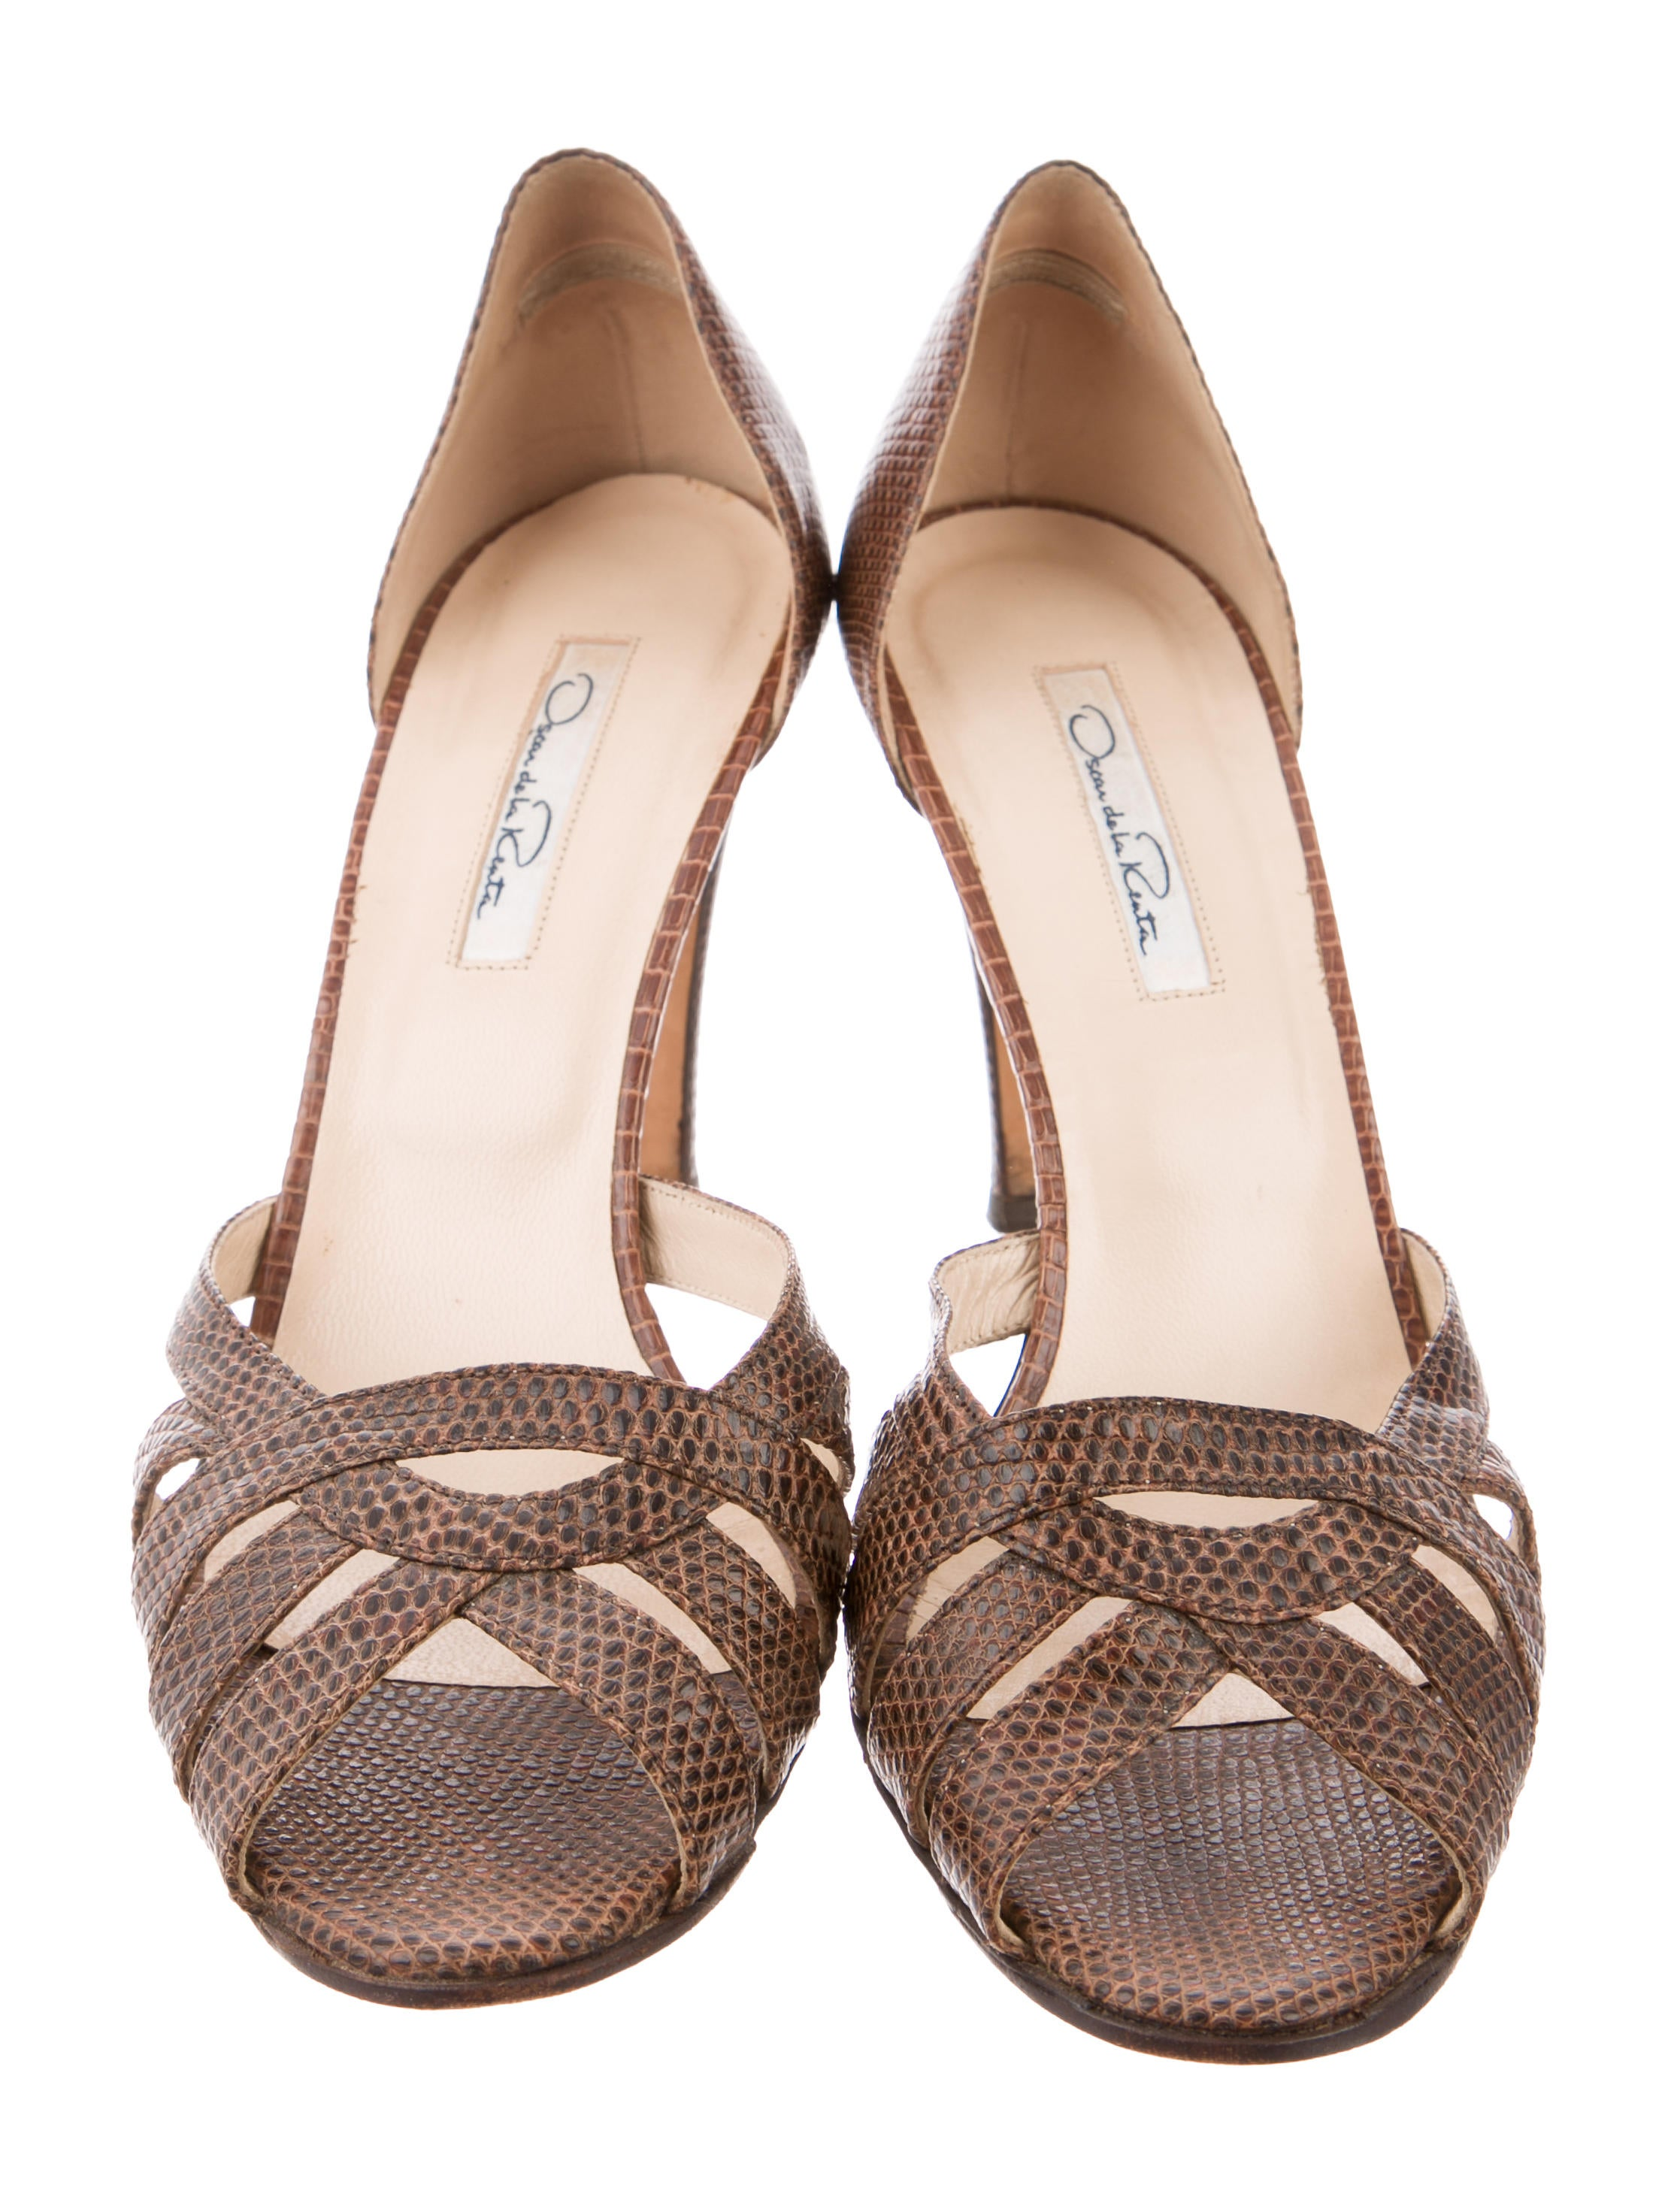 Oscar de la Renta Karung Cutout Sandals limited edition cheap price free shipping best 100% original cheap online excellent online Inexpensive NjZeJg